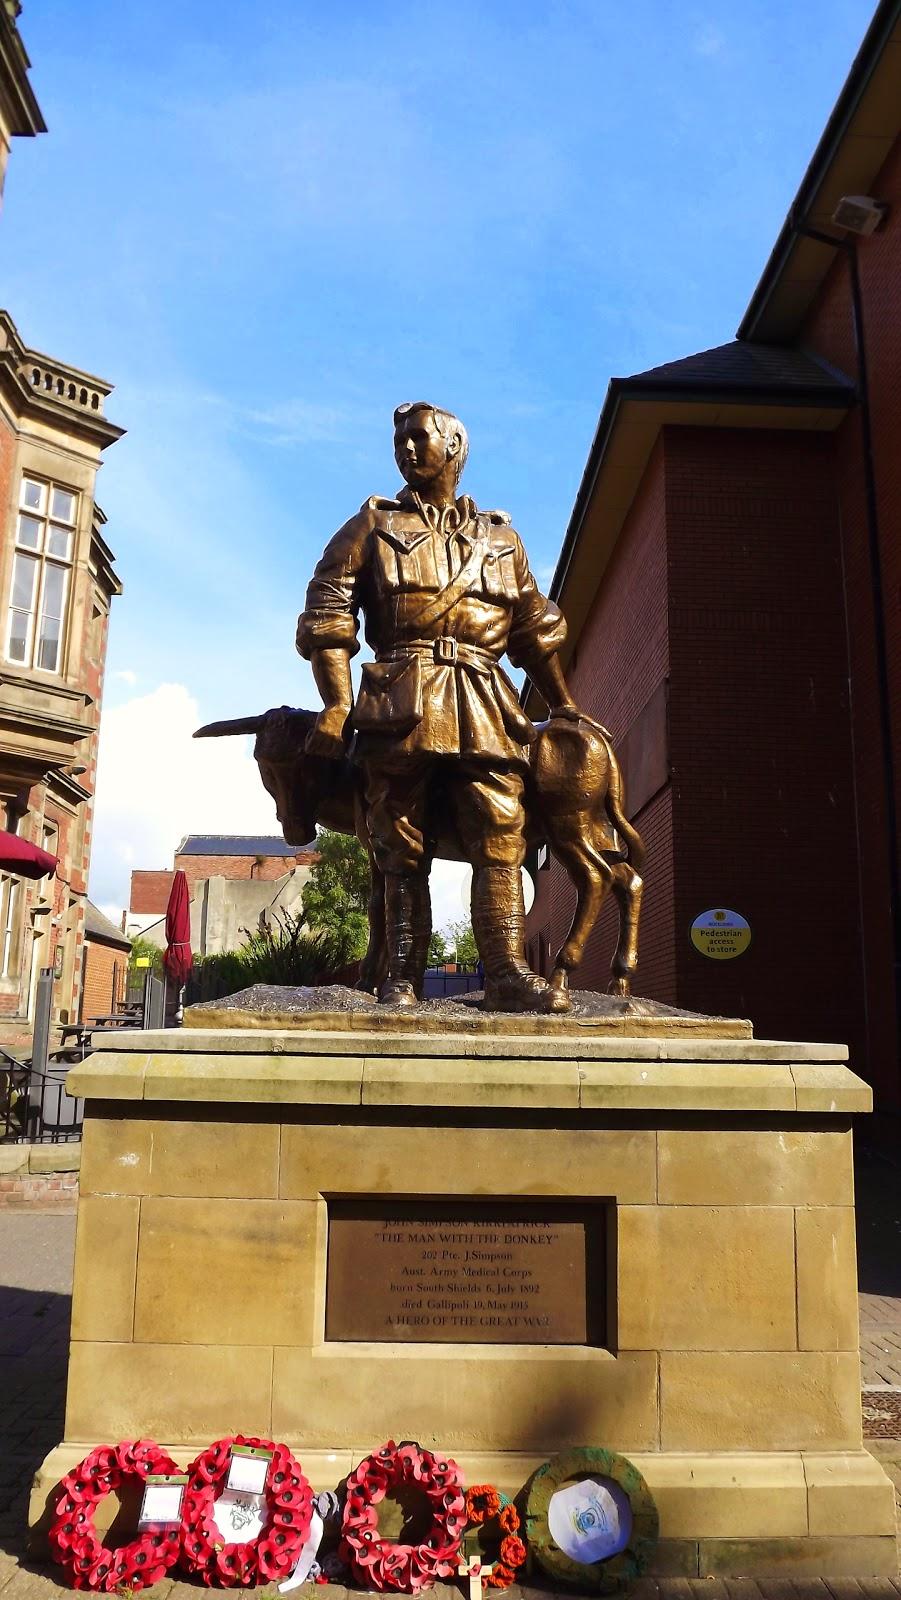 John Simpson Kirkpatrick, Photos South Shields, Gallipoli First World War South Shields, Newcastle War Memorial the Response, northumbrian images blogspot, Photos Photos South Shields, First World War, Tyneside,North East, England,Photos,Photographs